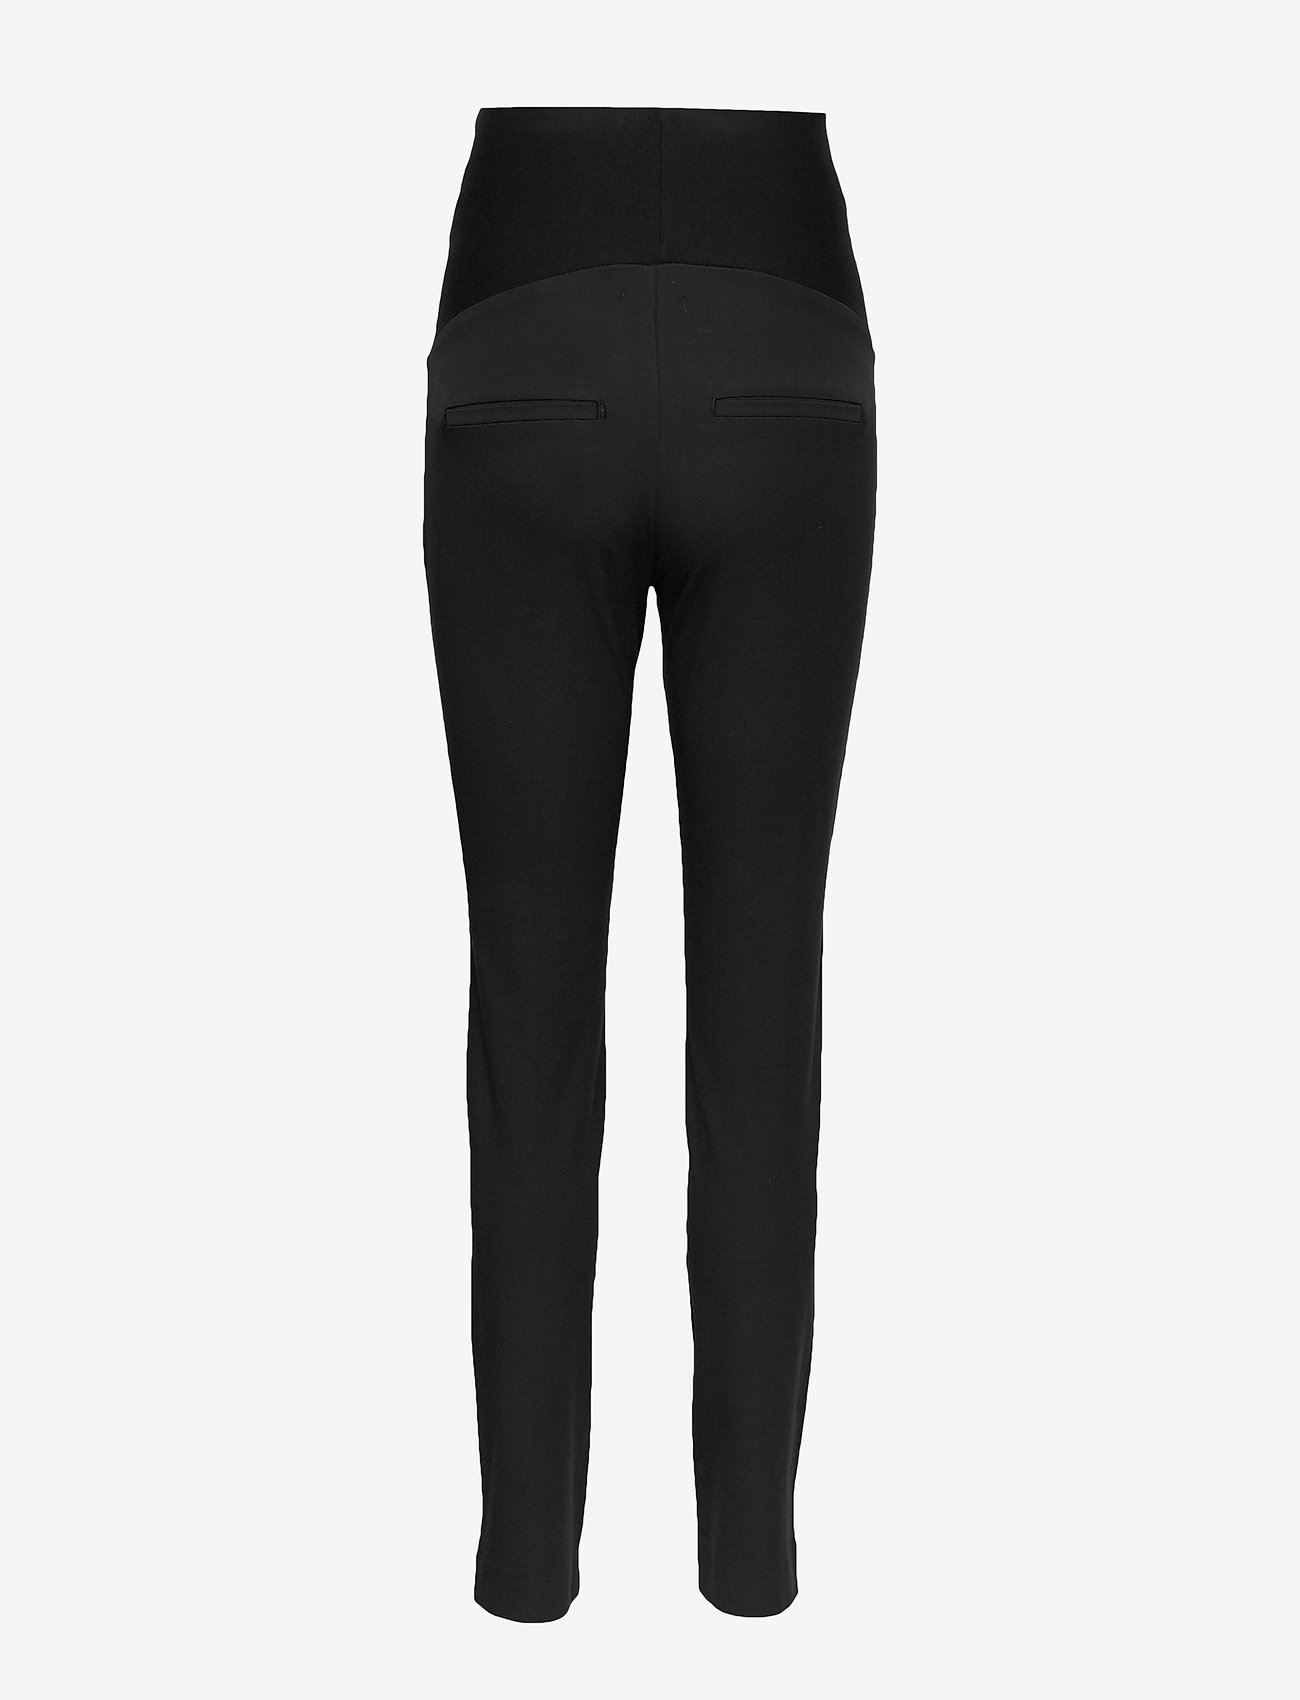 Trousers Mom Jonna (Black) (39.99 €) - Lindex HiLXD